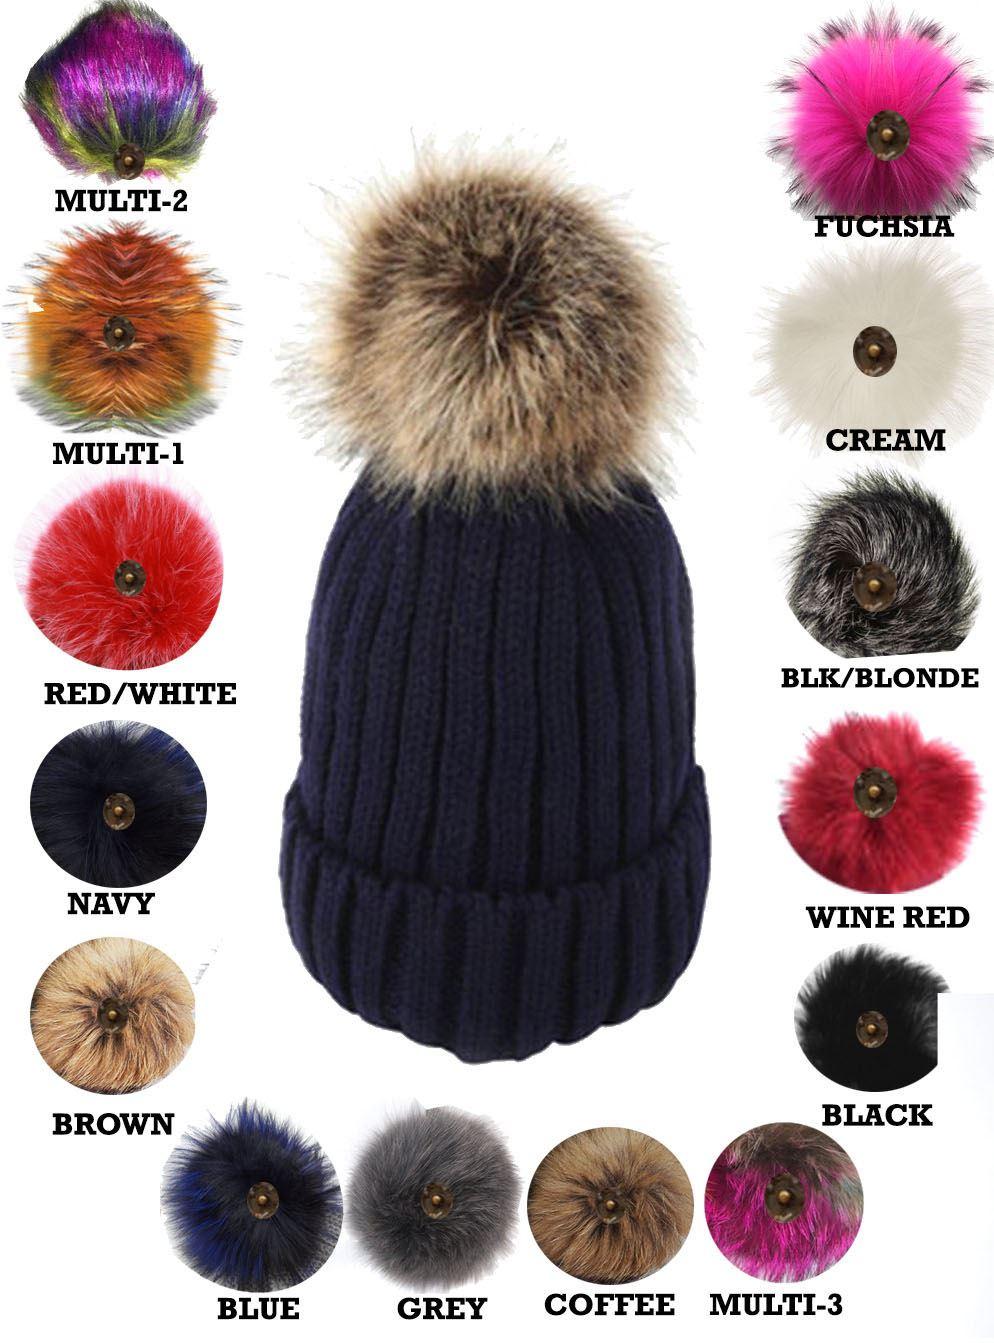 ab3f7471312 New Ladies Knitted Detachable Faux Fur Pom Pom Customizable Bobble ...